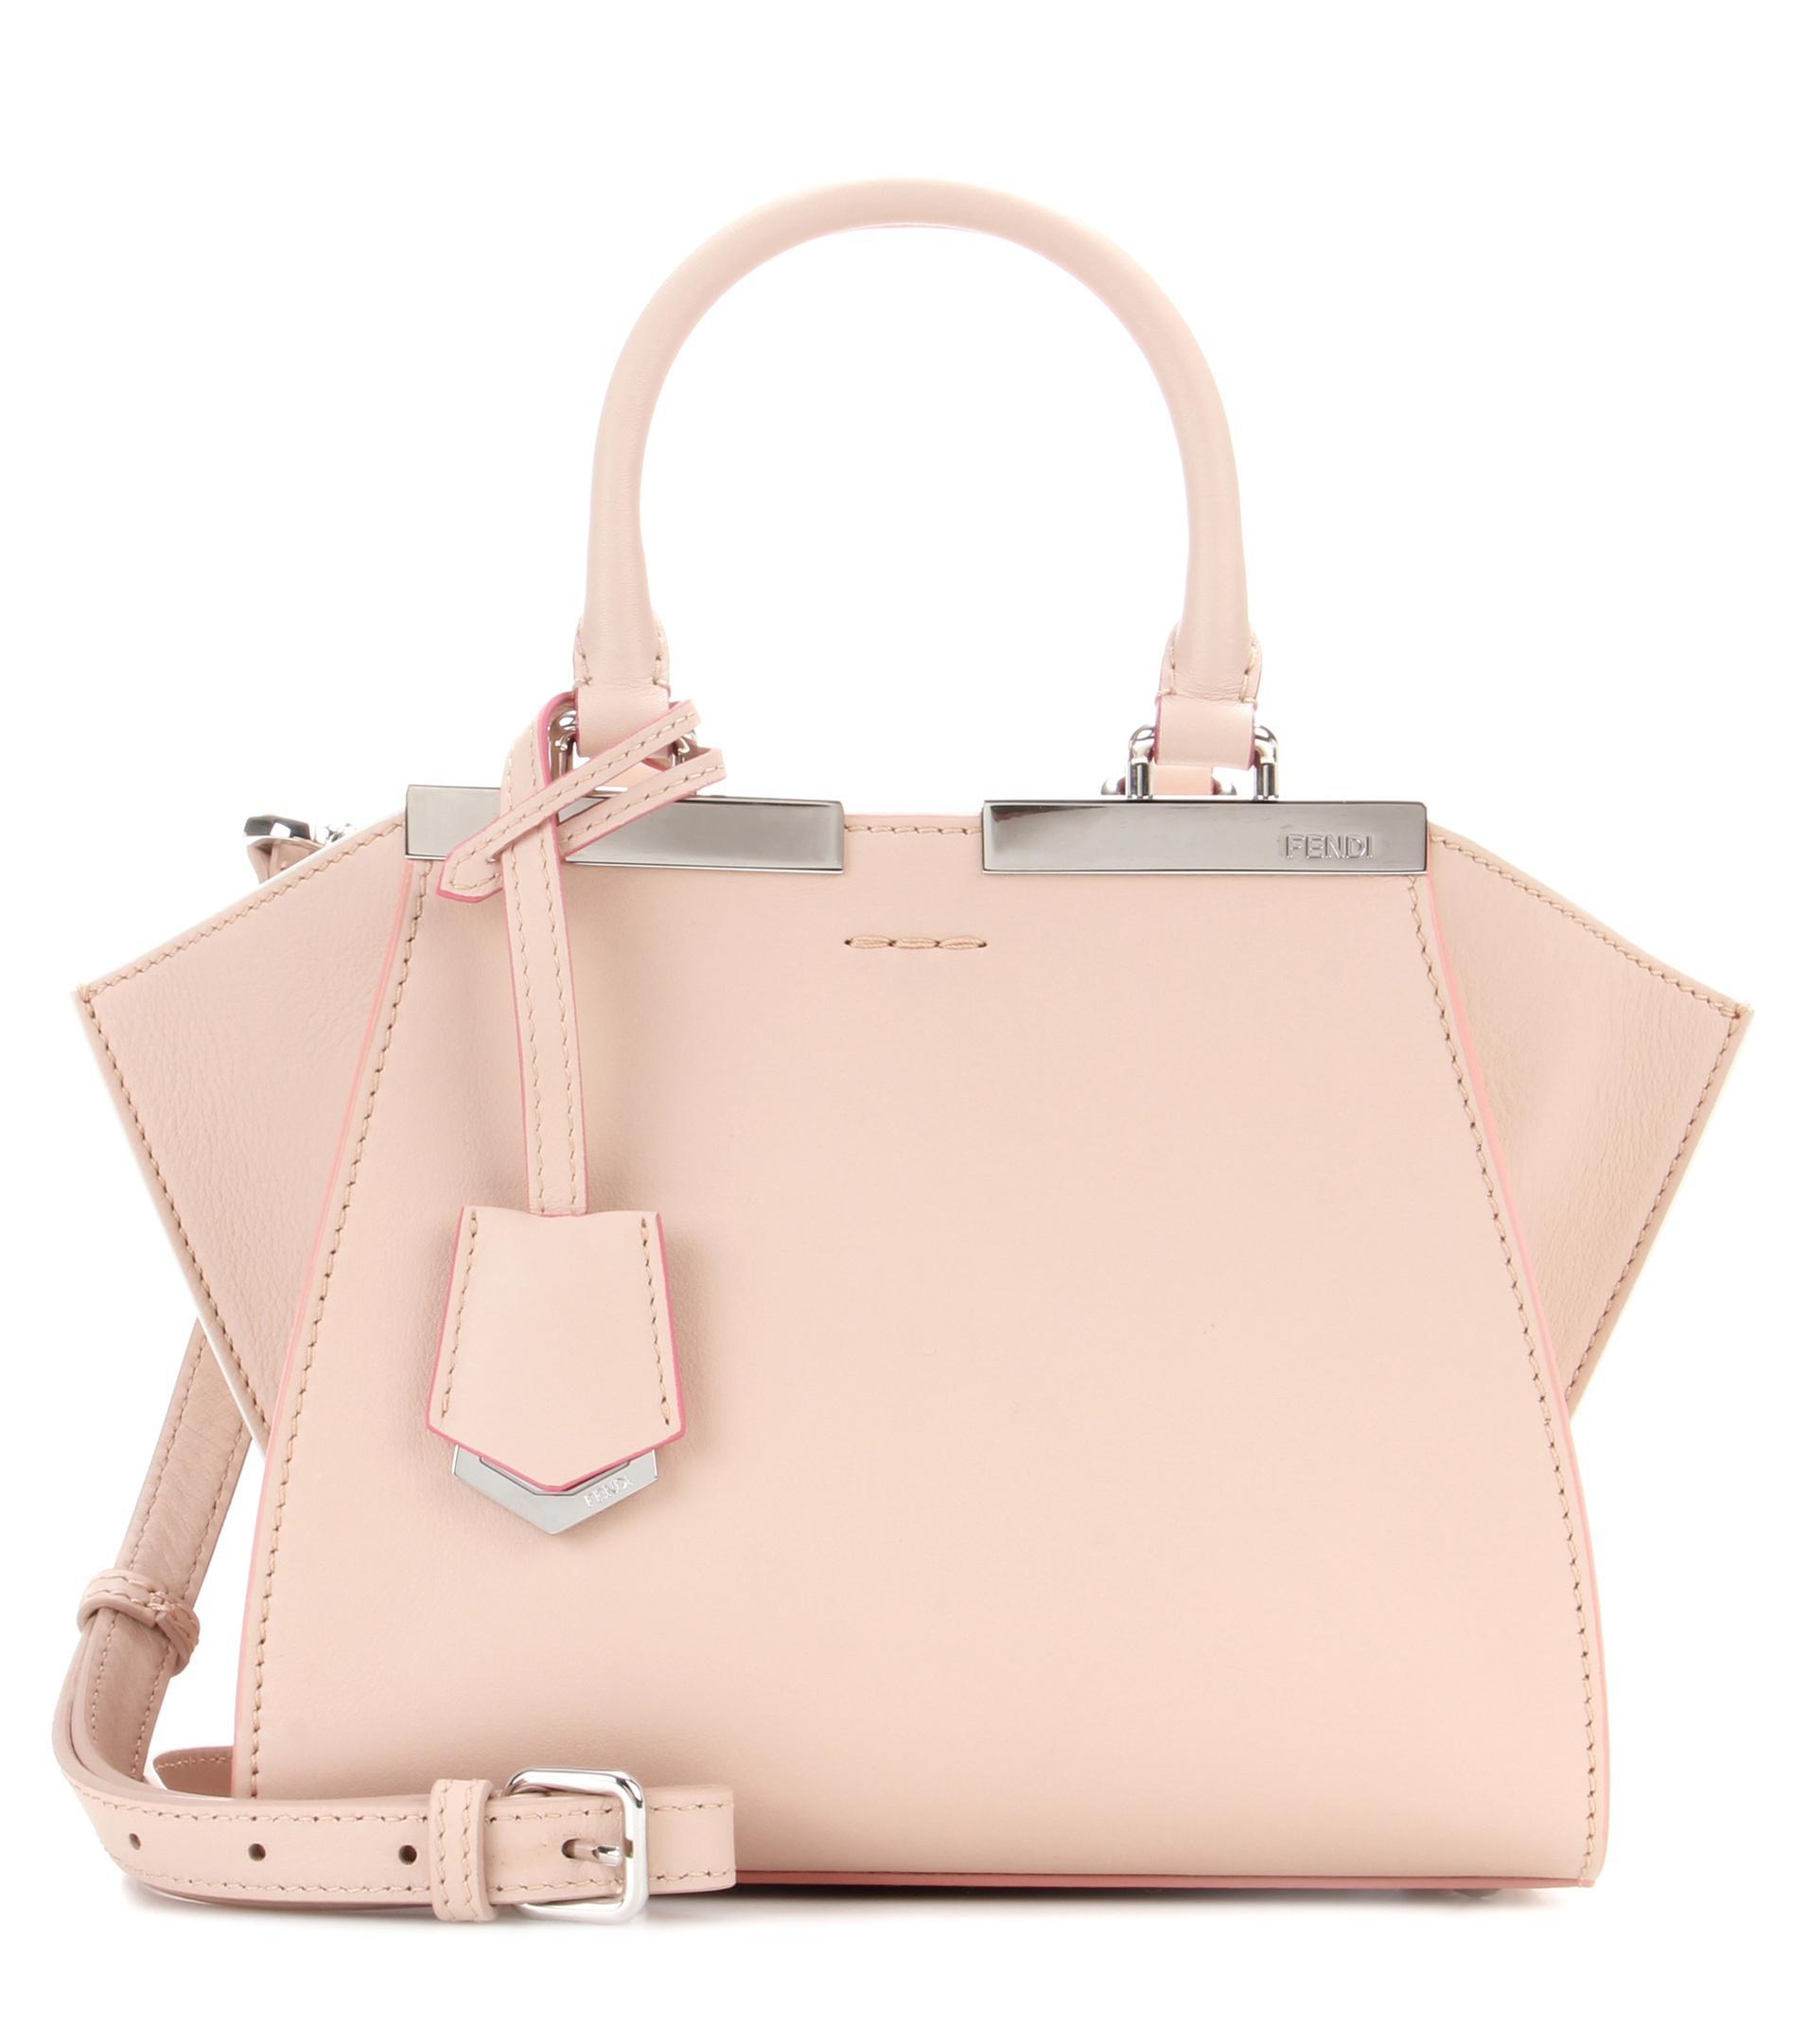 Fendi 3jours Mini Leather Tote in Pink - Lyst c57eea639ec9f